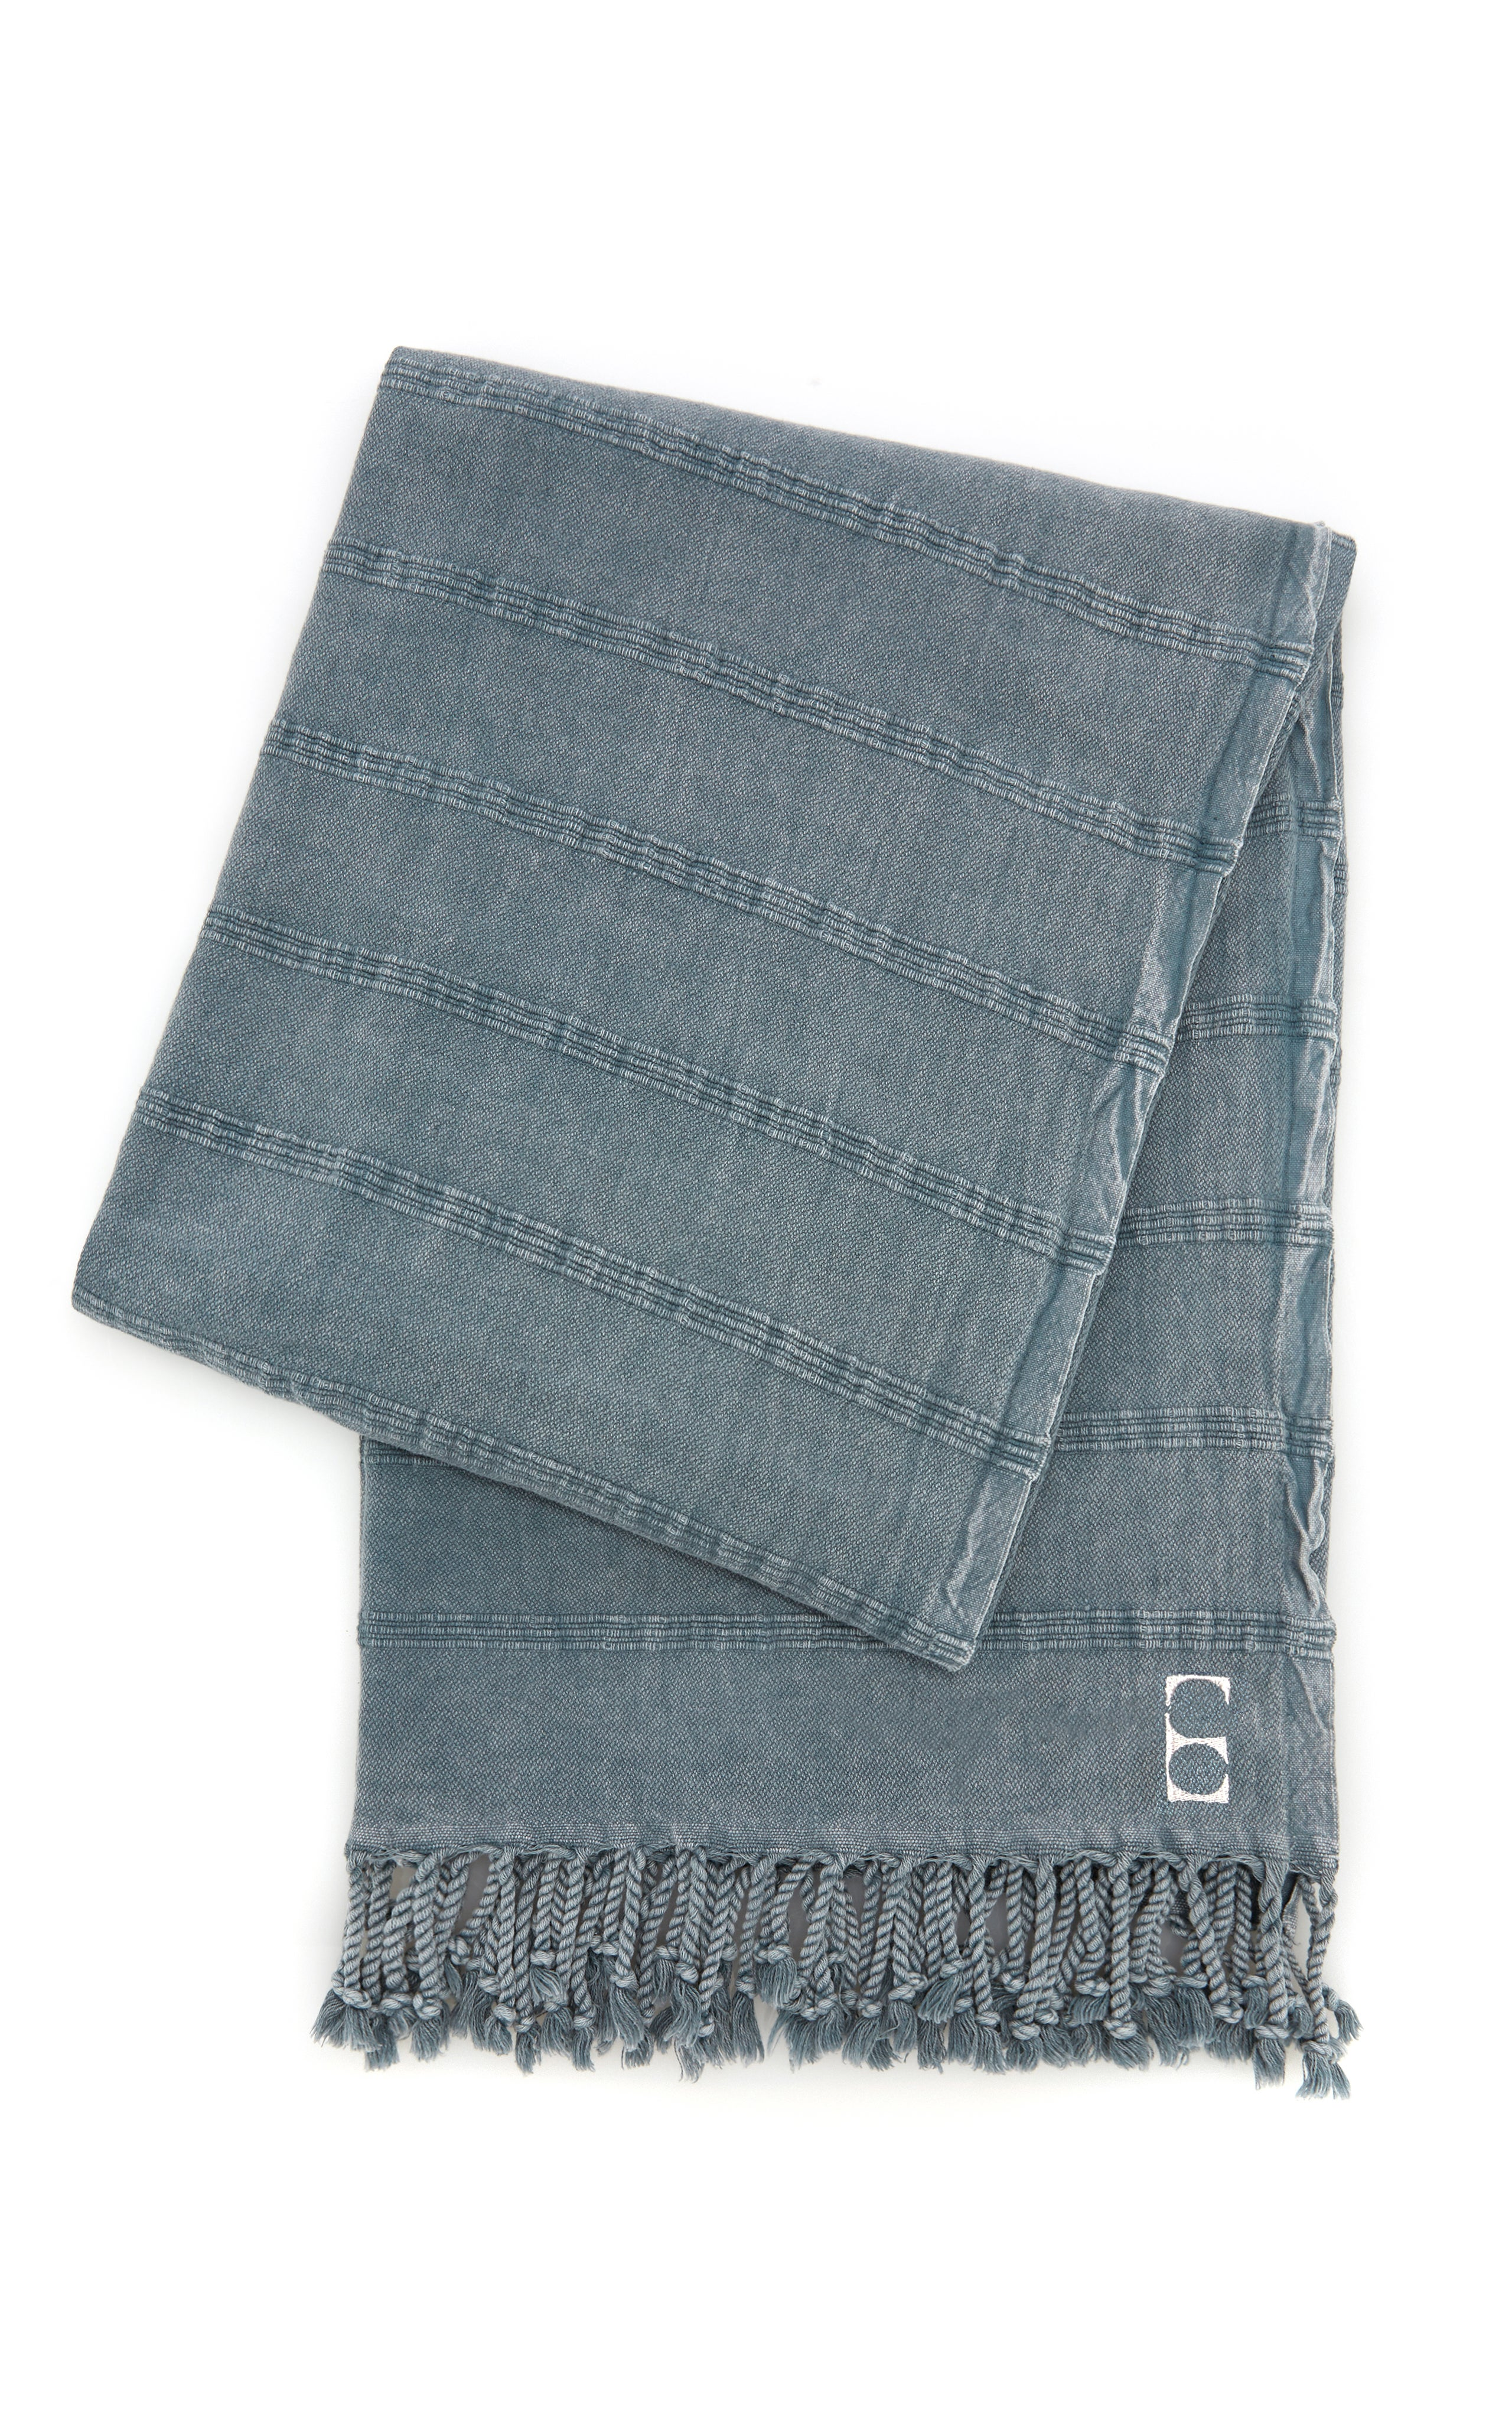 Gigi-Towel-Denim-Flat